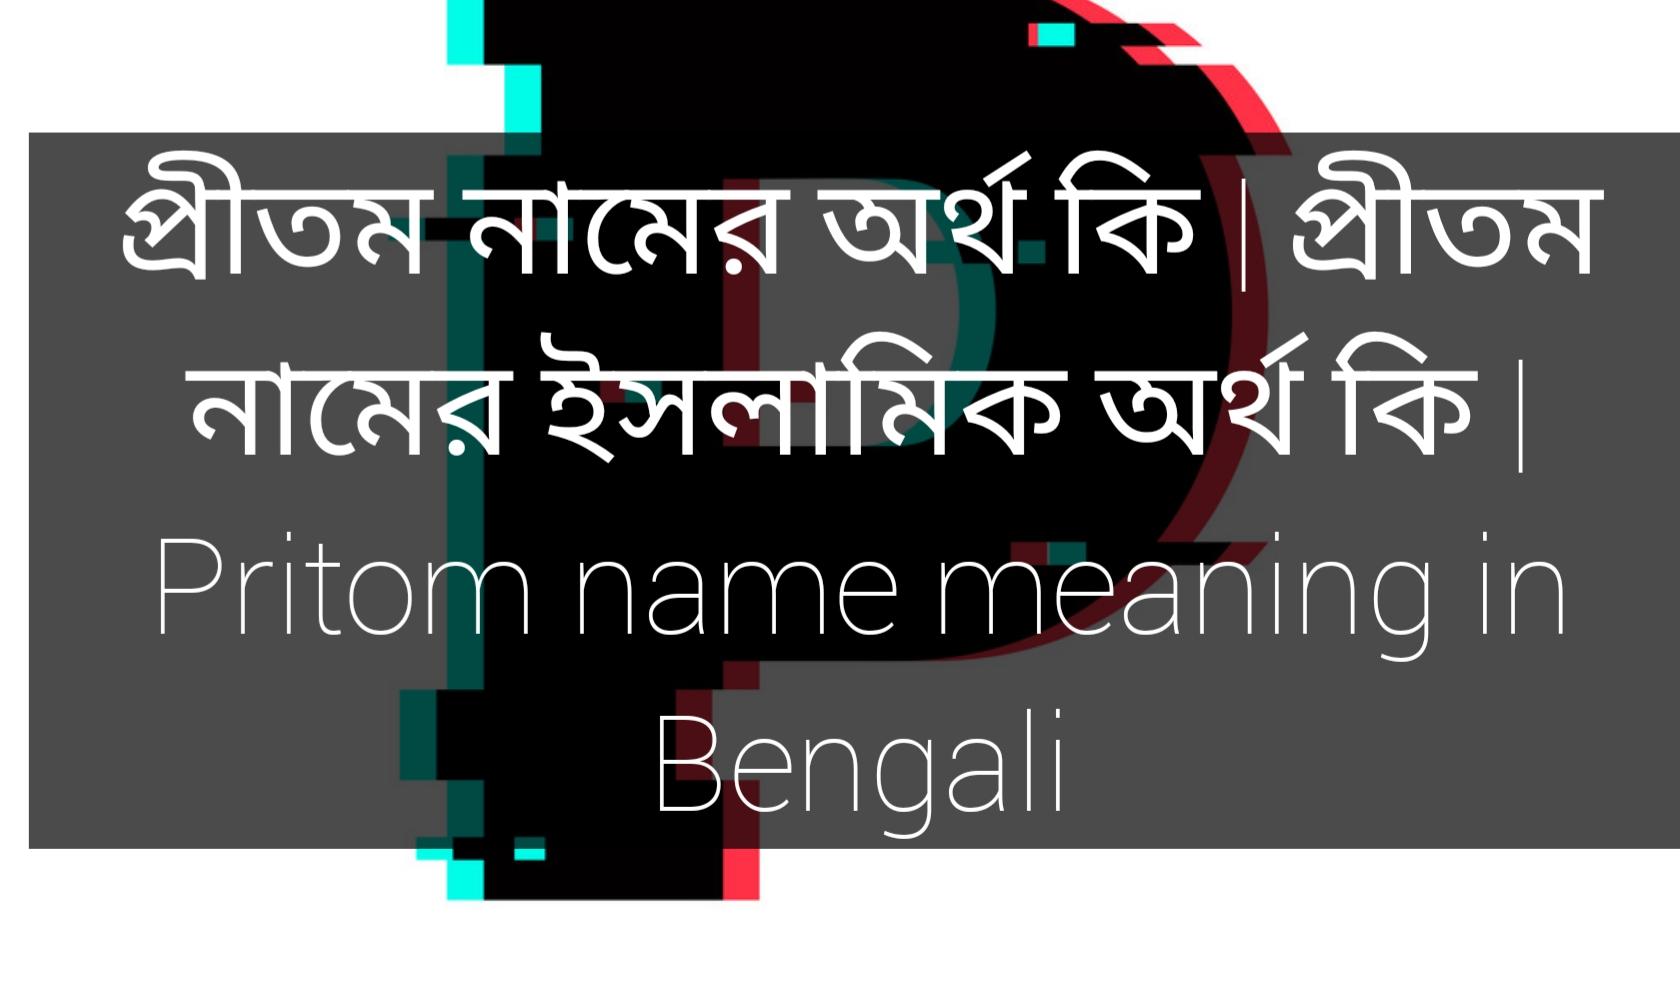 pritom name meaning in Bengali, প্রীতম নামের অর্থ কি, প্রীতম নামের বাংলা অর্থ কি, প্রীতম নামের ইসলামিক অর্থ কি,